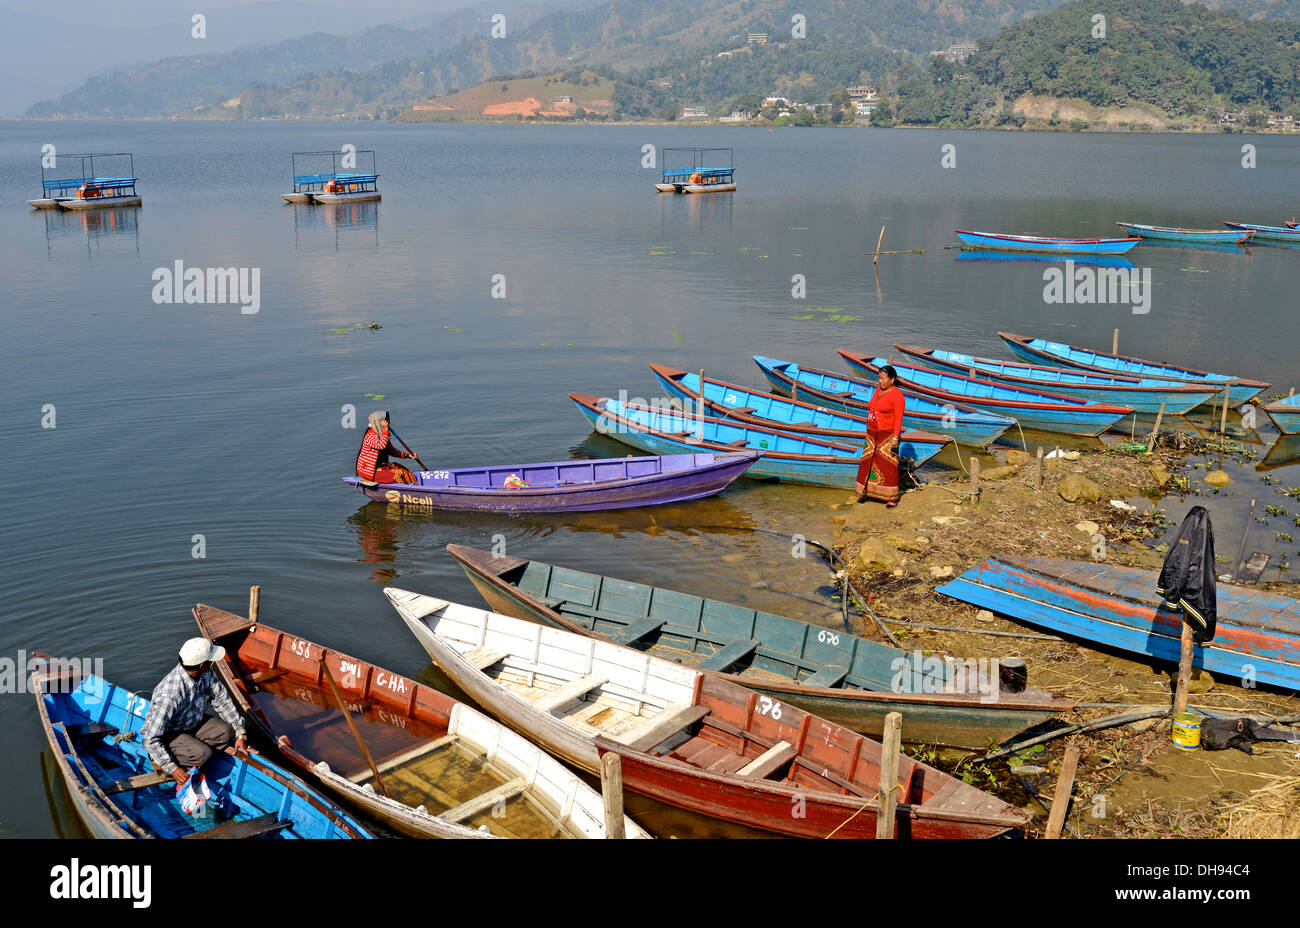 Wooden rowboats in Pokhara lake, or Phewa Lake Nepal - Stock Image